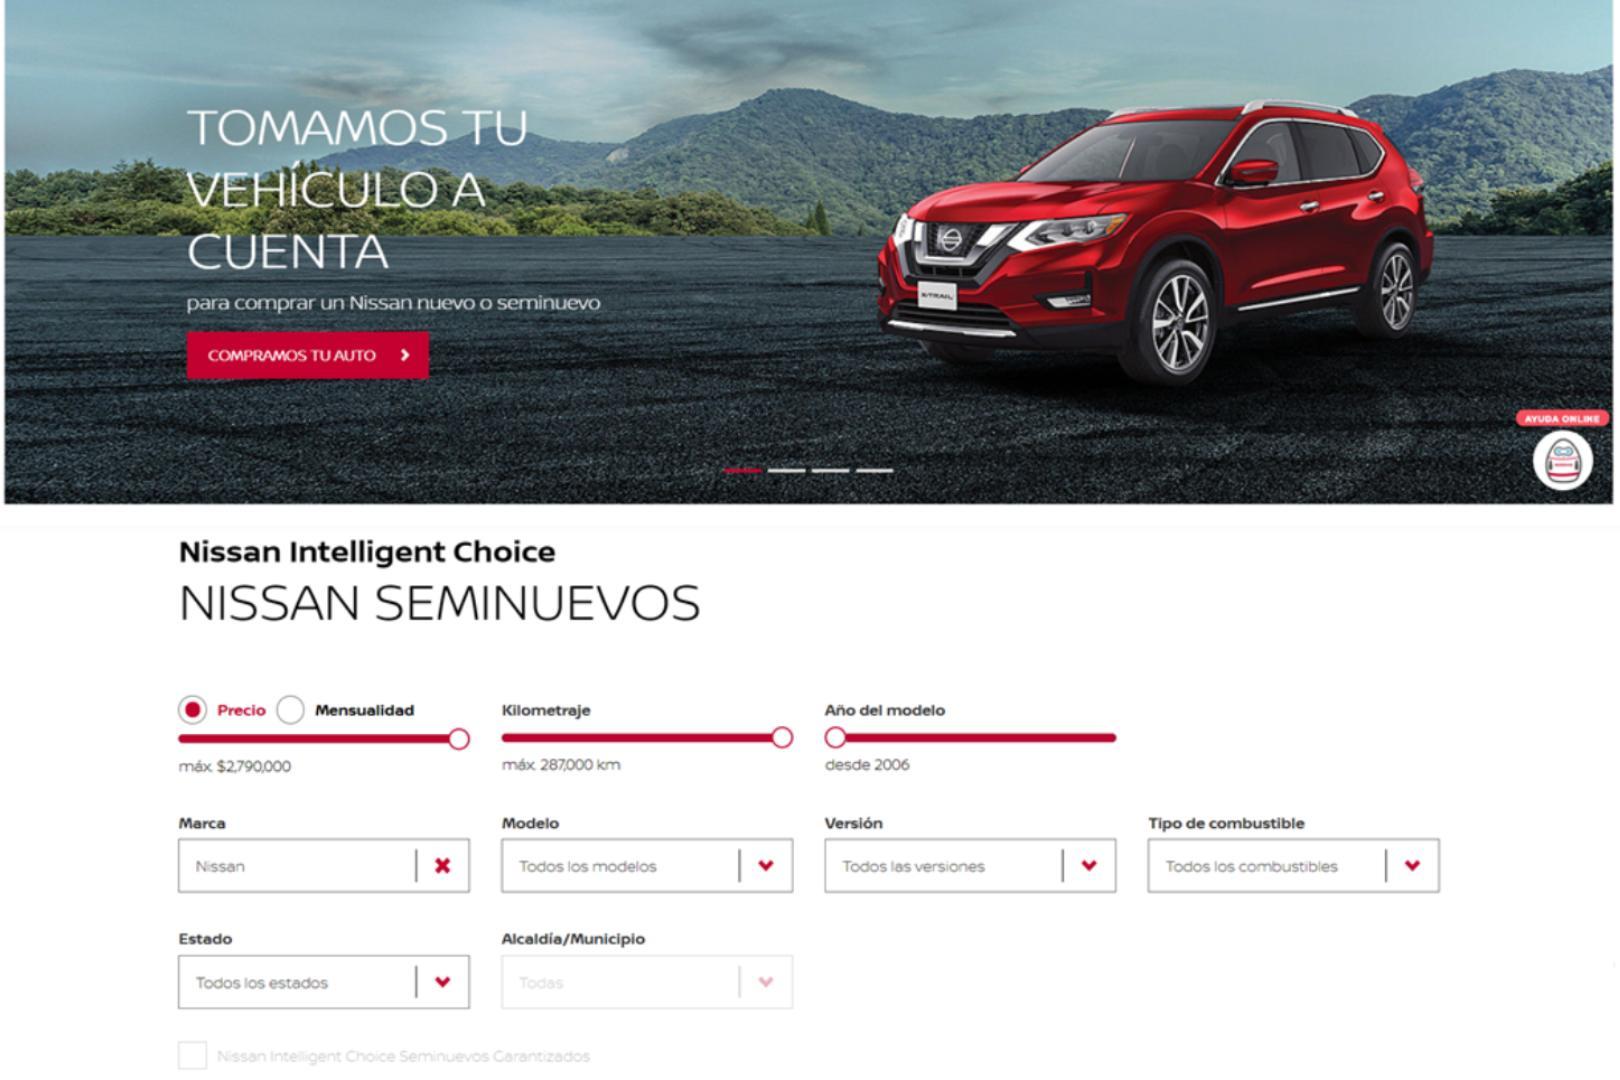 Nissan Intelligent Choice, Seminuevos Garantizados,